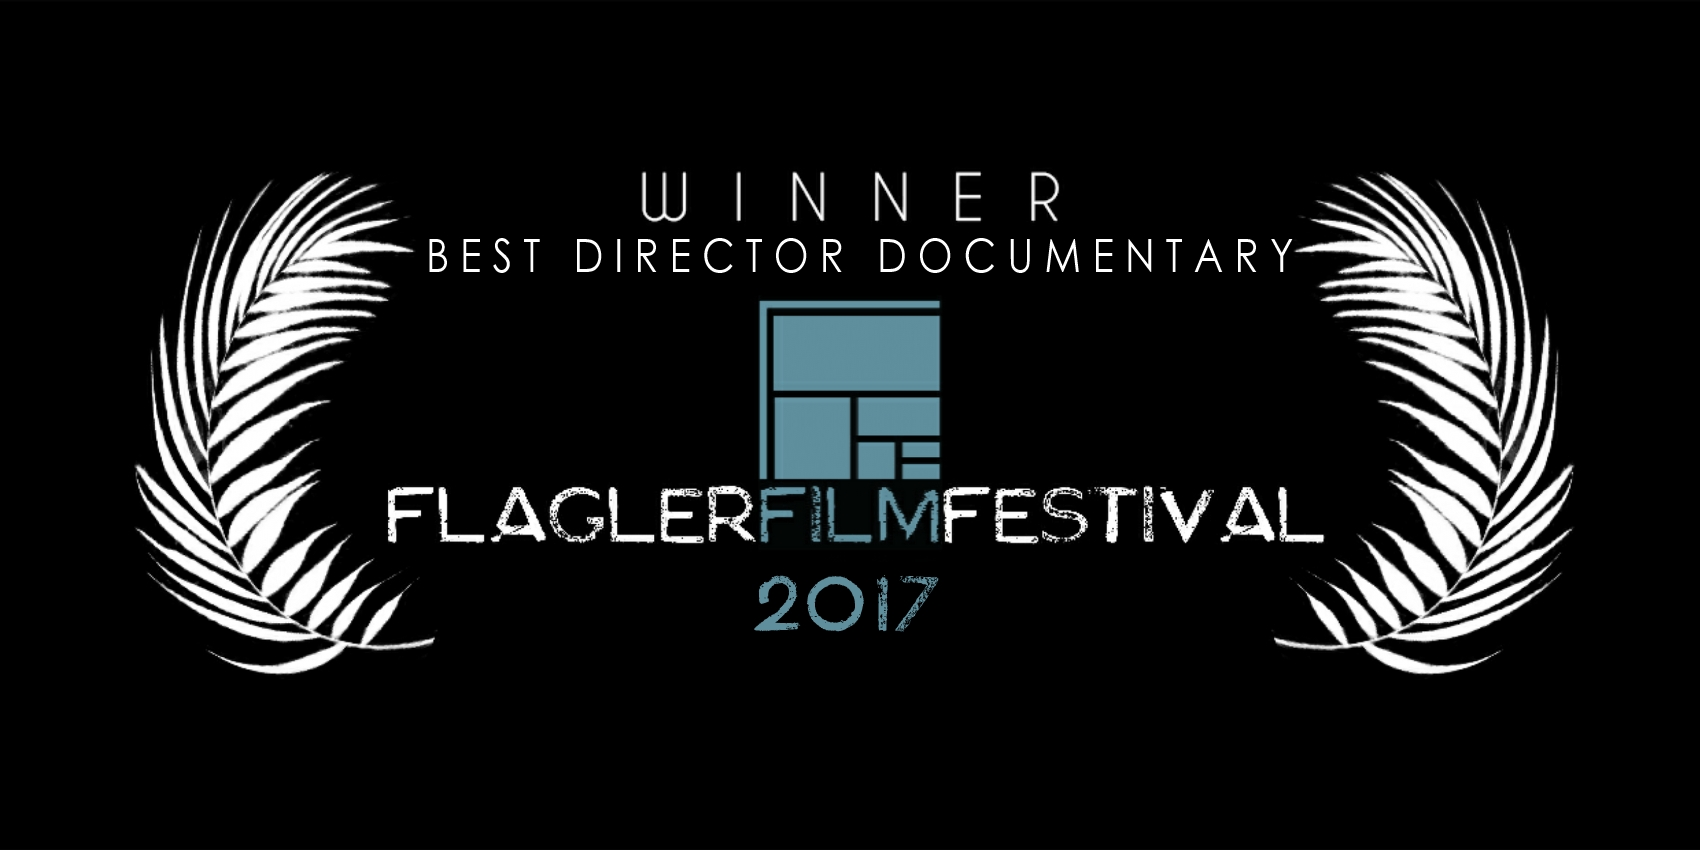 2017 Best Director Documentary.jpg